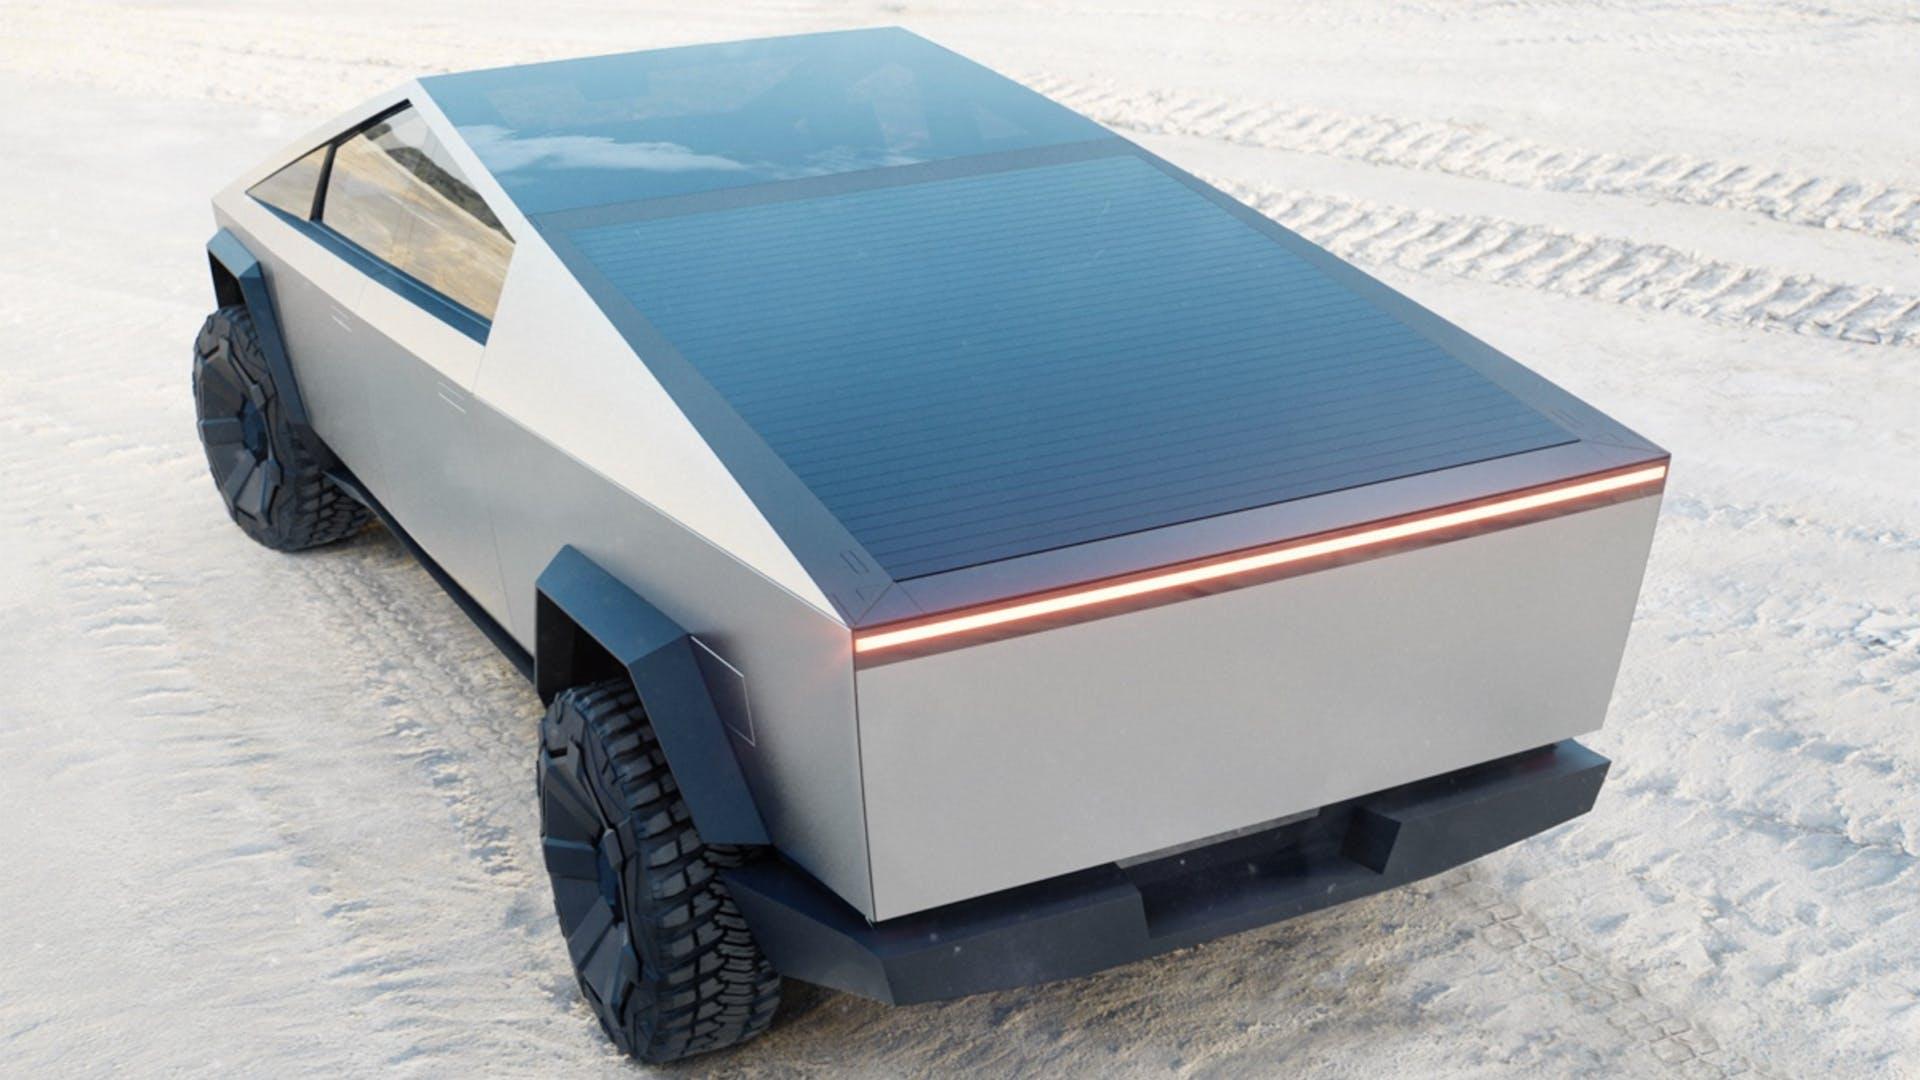 Painel solar da Tesla Cybertruck